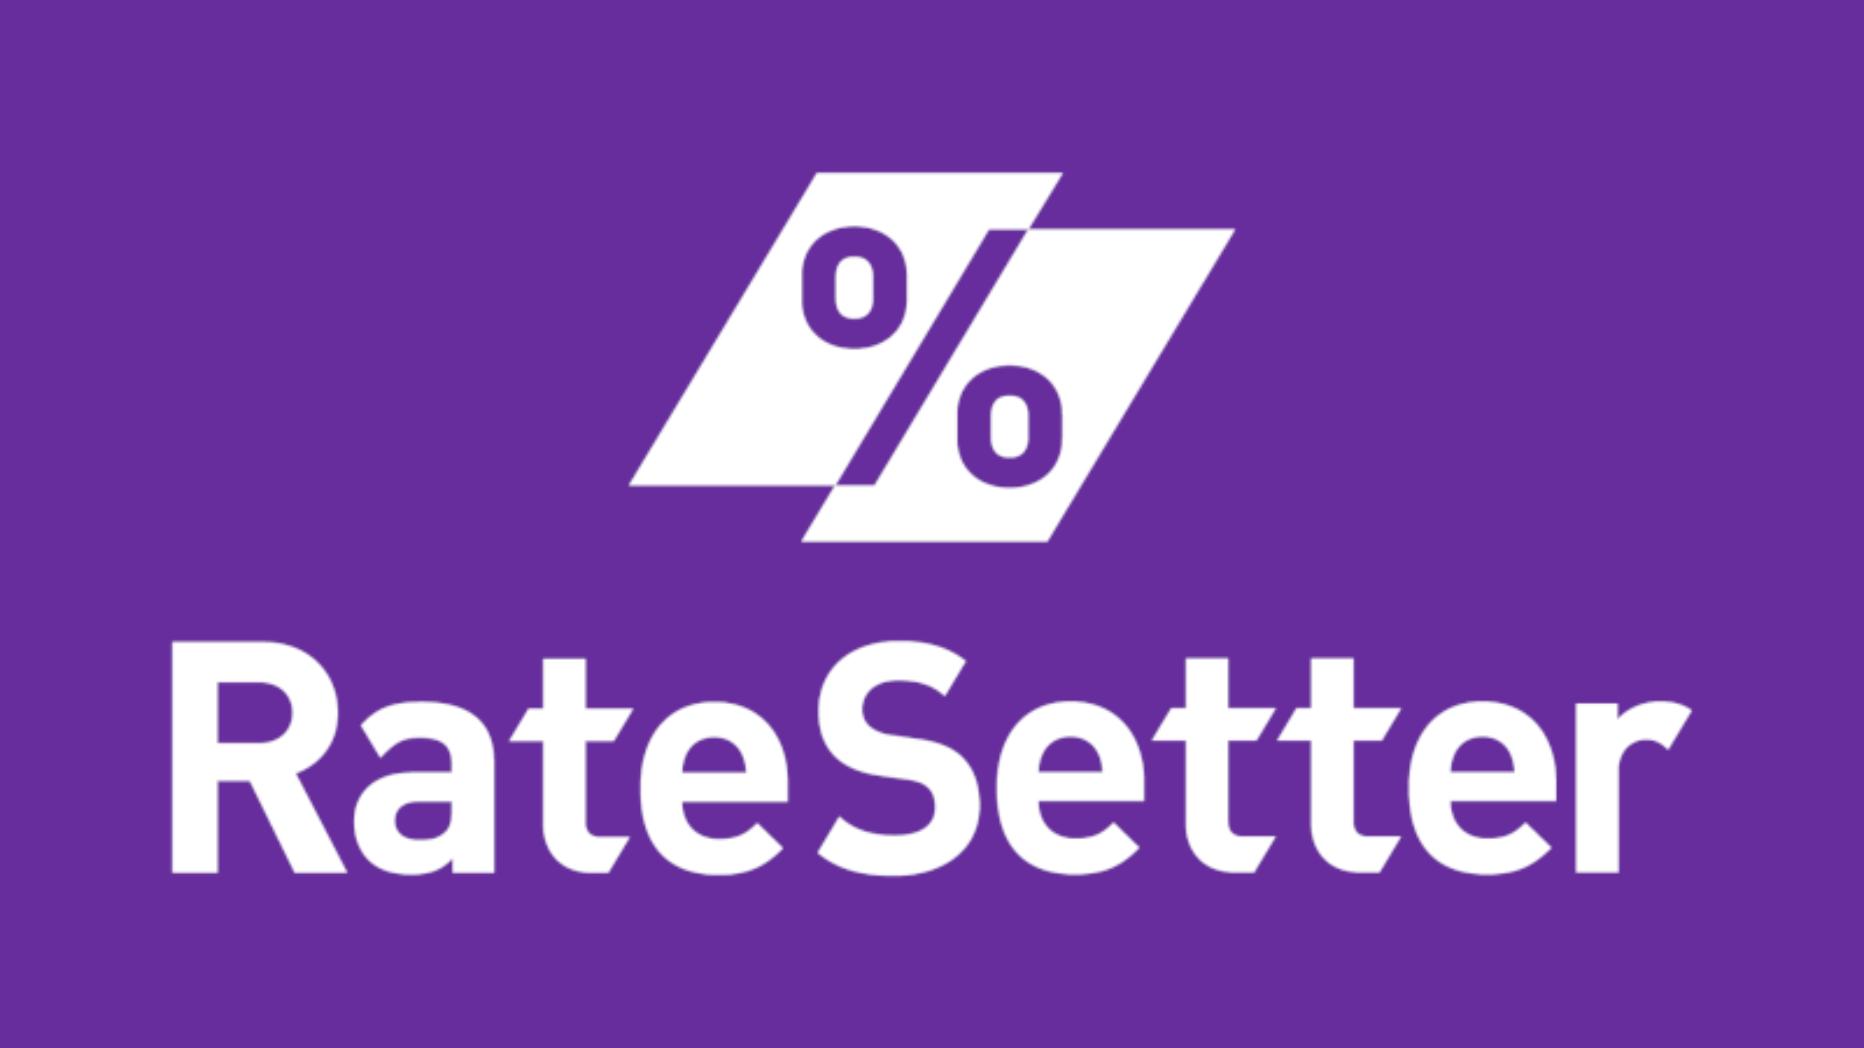 Ratesetter-Main-Image-2-1864x1048